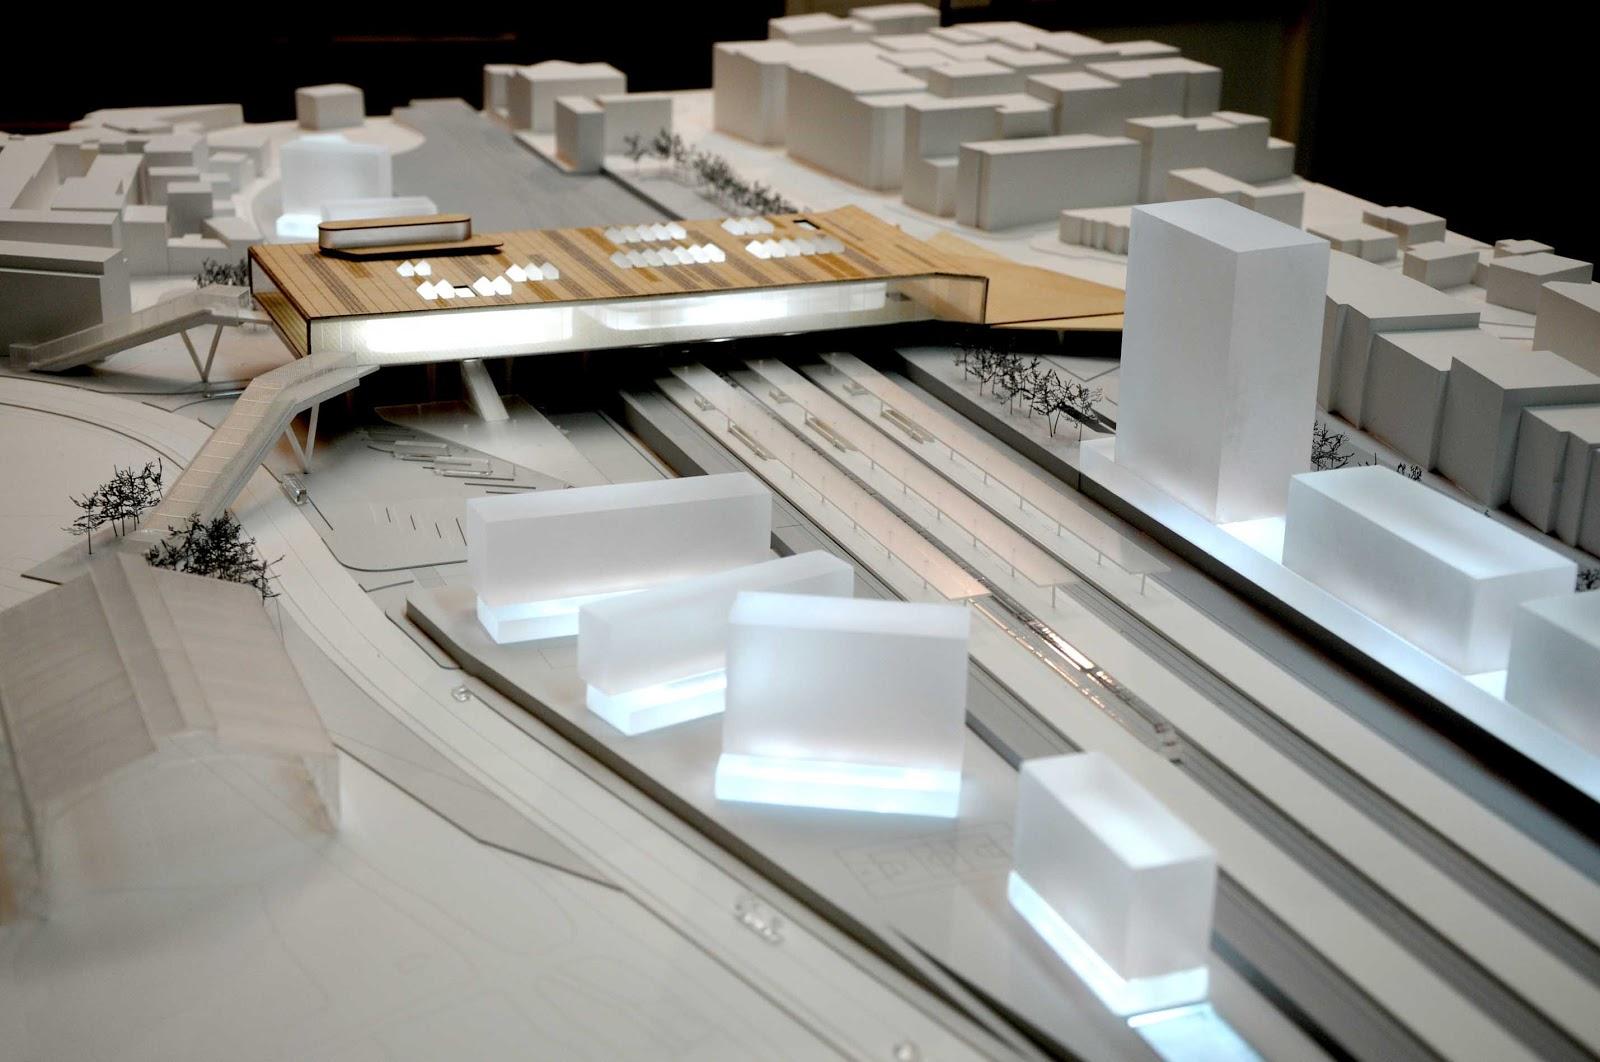 Habitar estaci n intermodal en santiago de compostela - Arquitectos en santiago de compostela ...